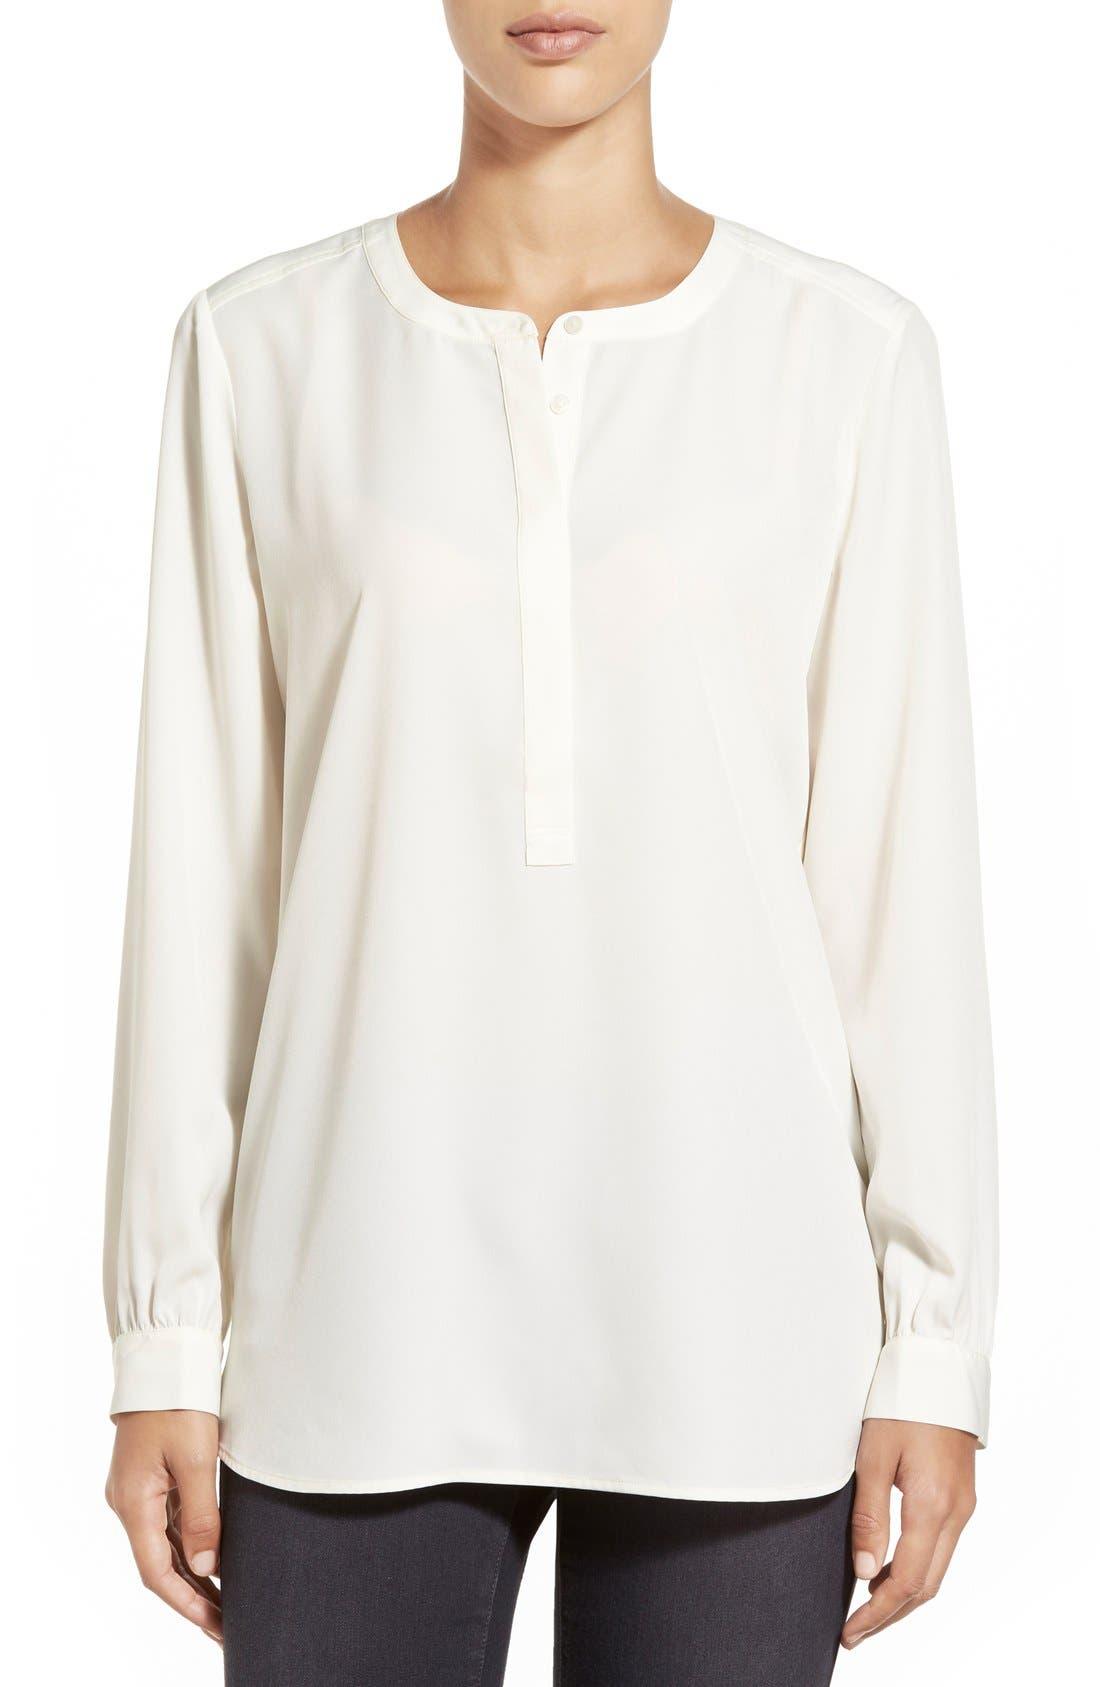 Main Image - NYDJ Woven Tunic Top (Regular & Petite)